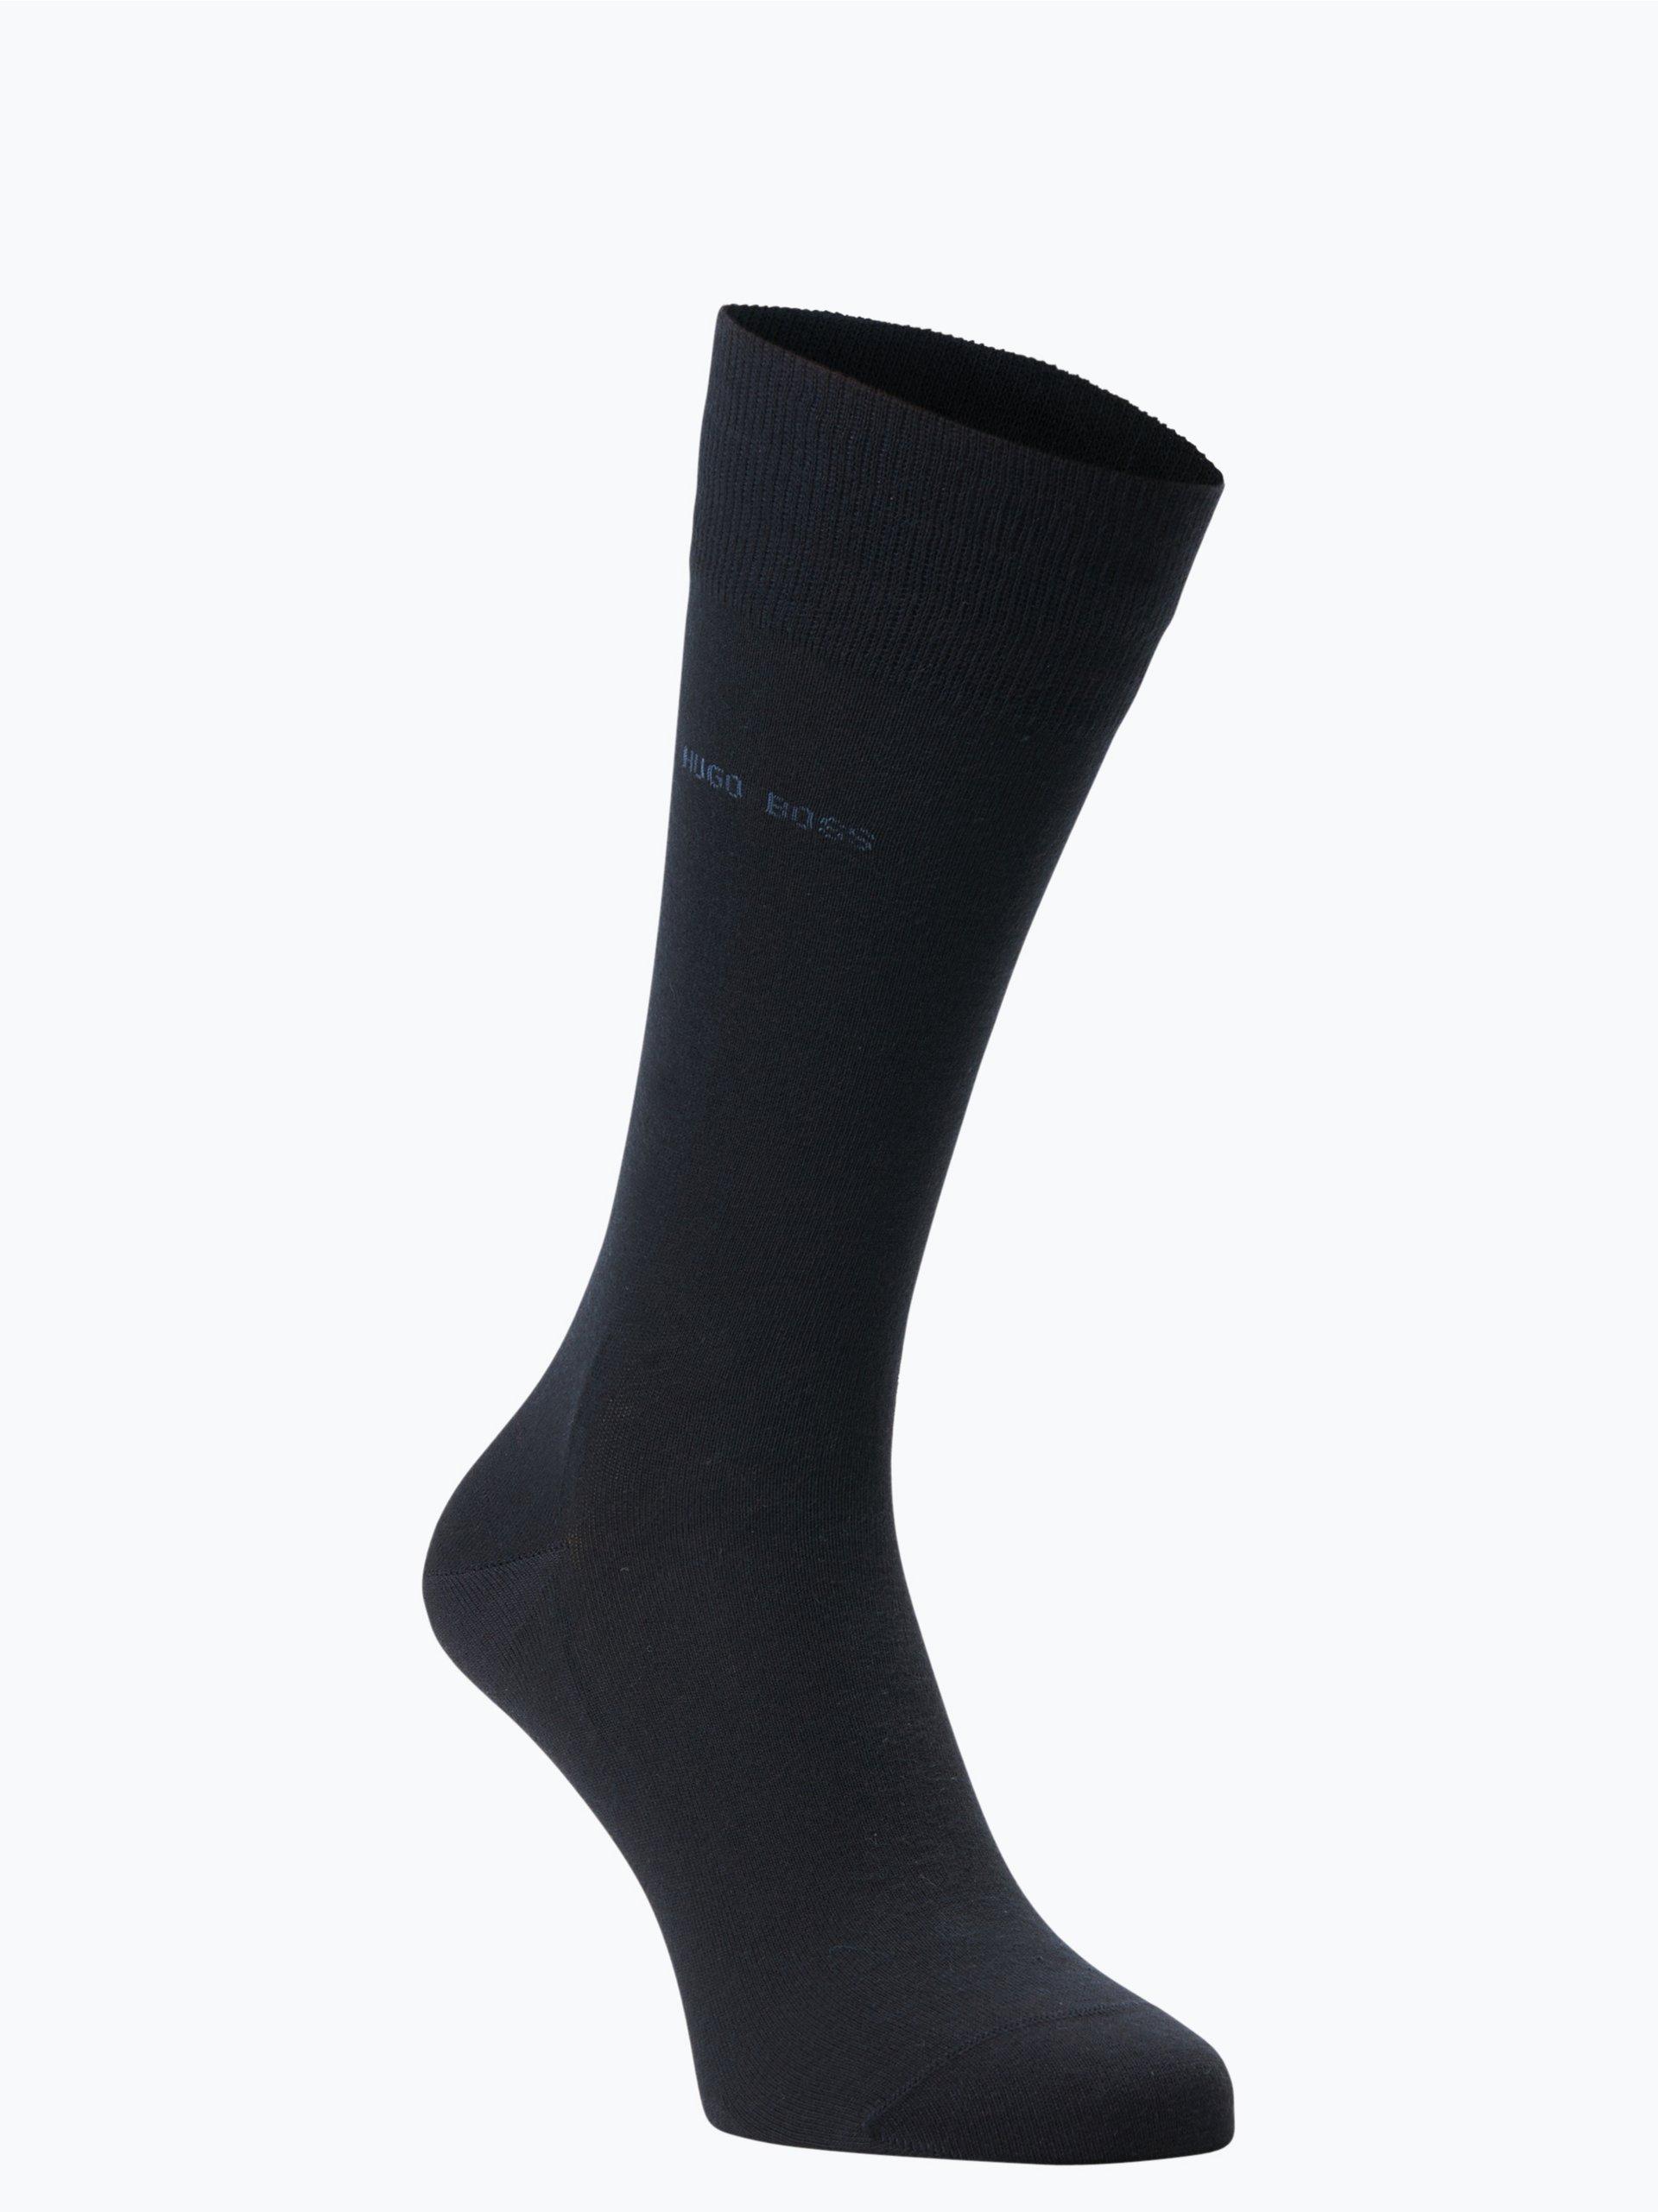 BOSS Herren Socken - Marc